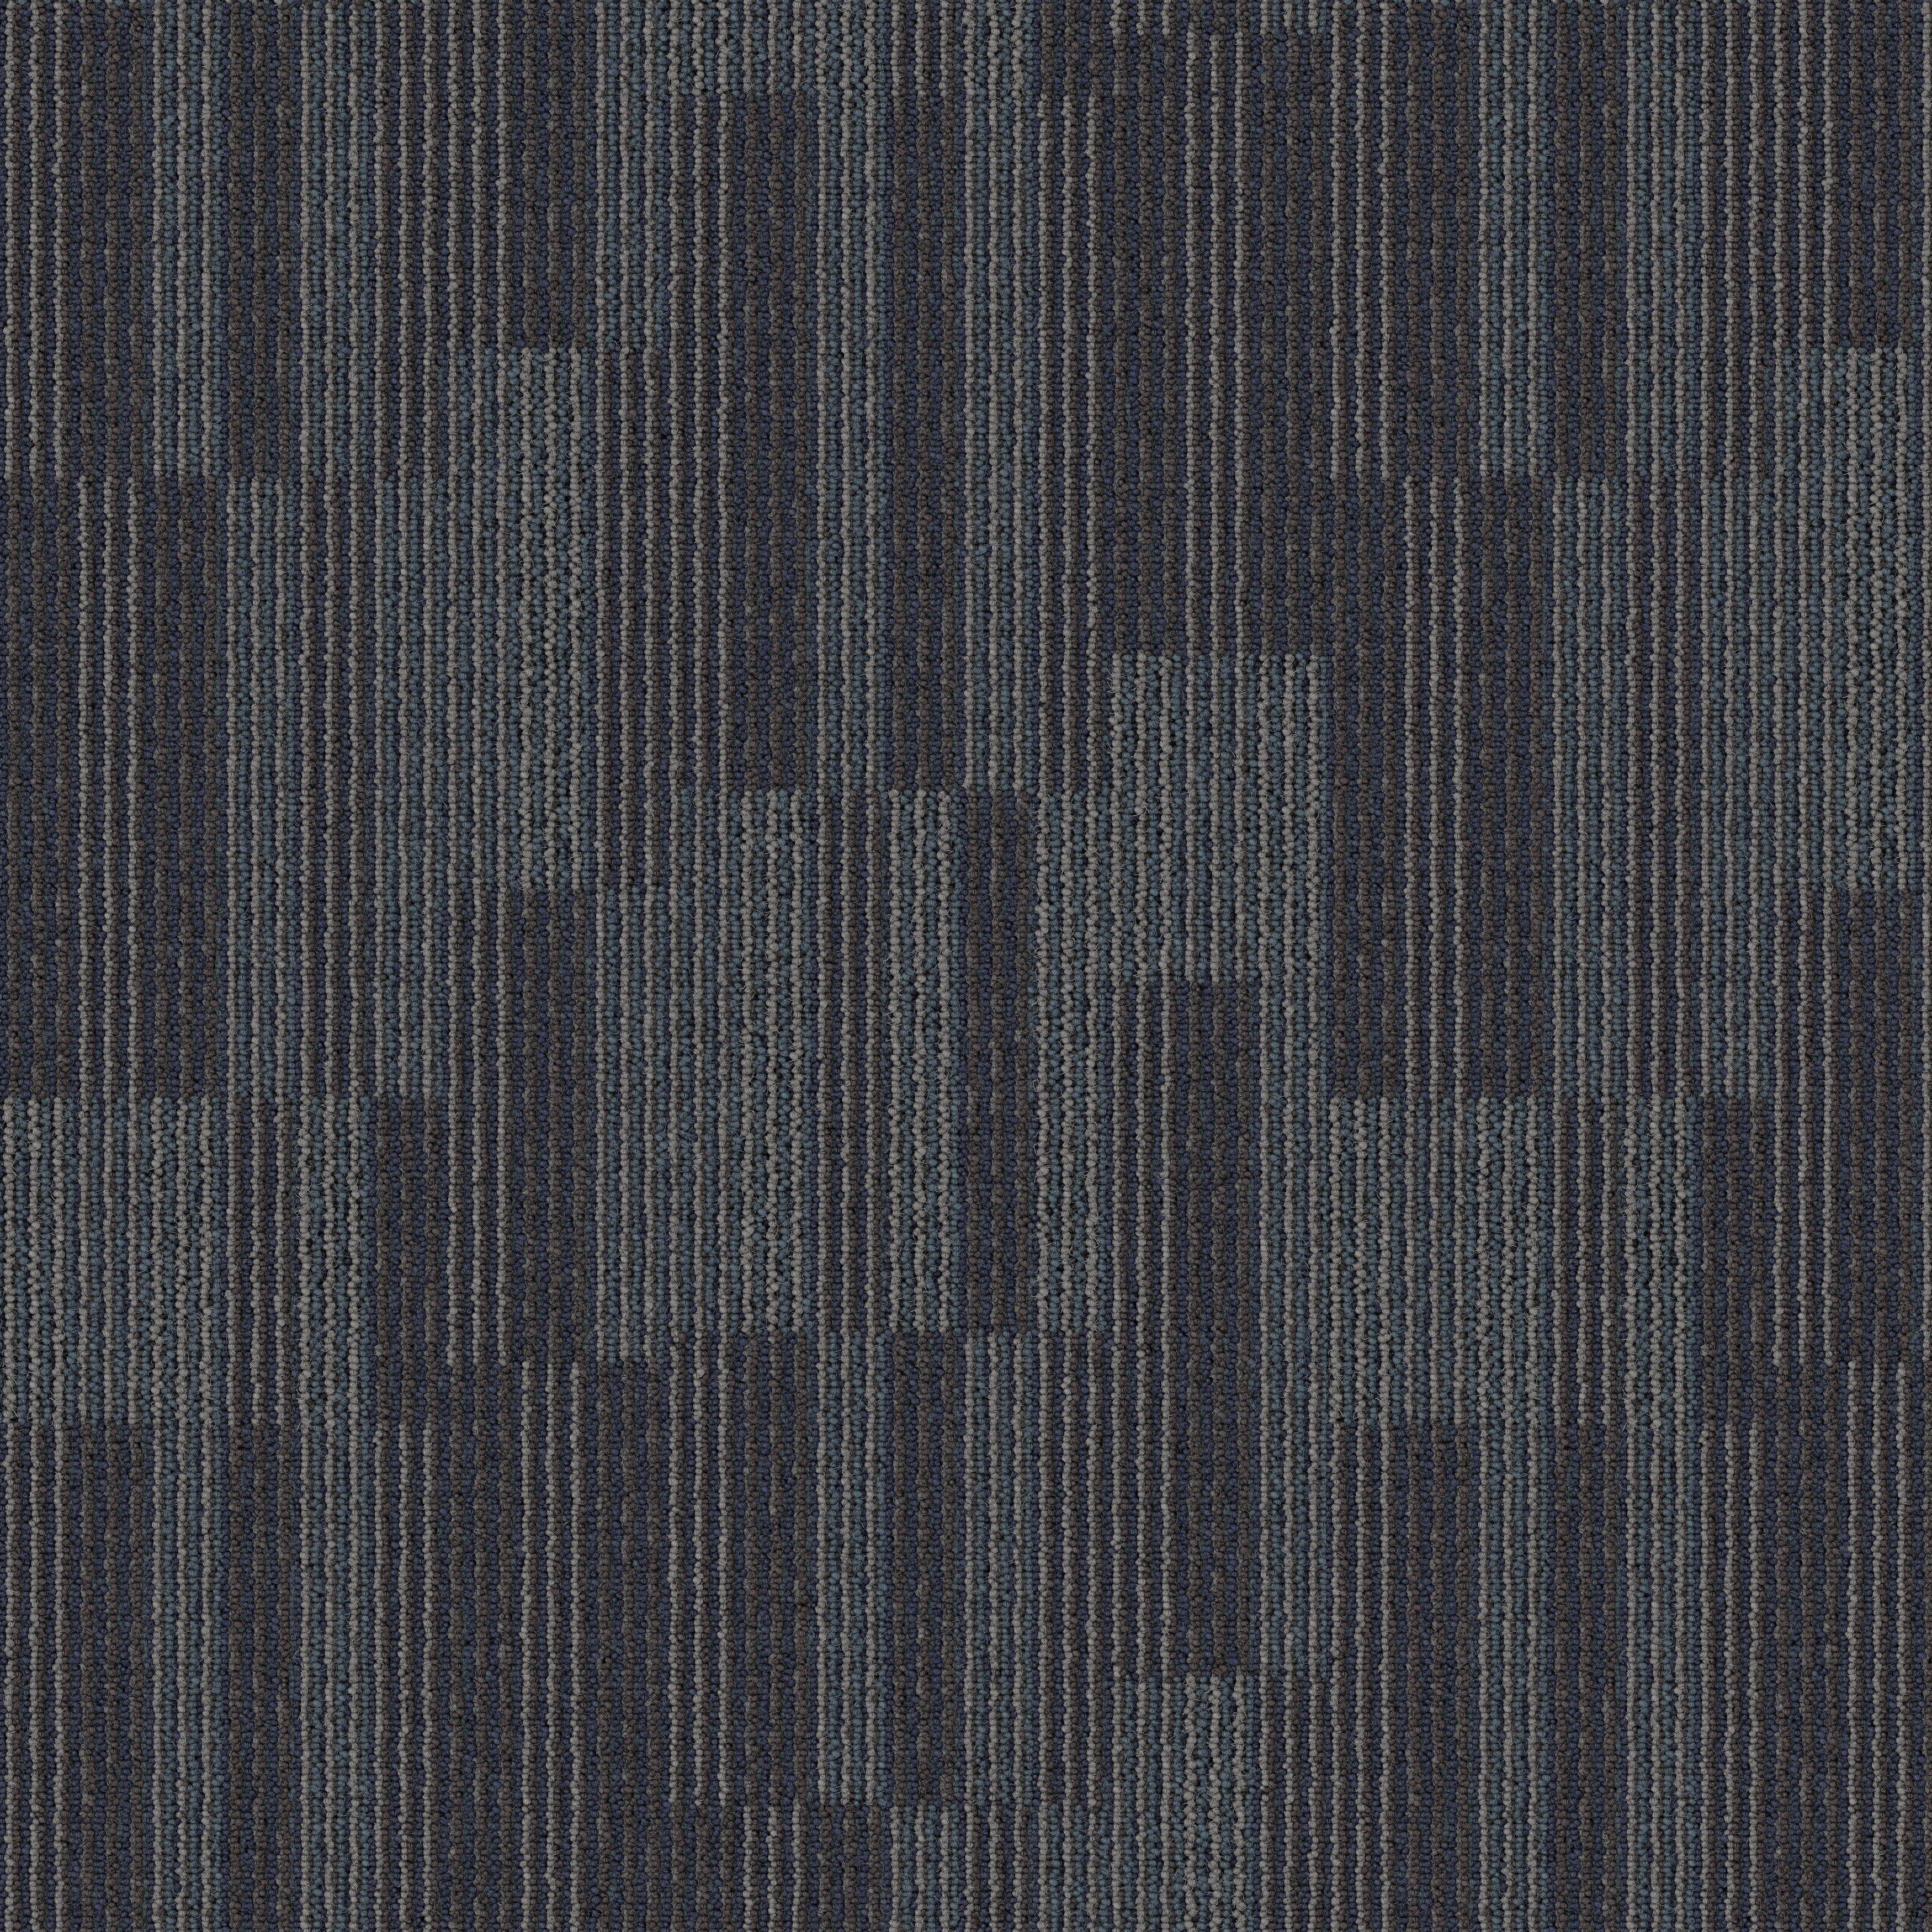 Mohawk Derry 24 X 24 Carpet Tile In Opal Sample Blue Sample Grey Size 24 X 24 Carpet Tiles Textured Carpet Rugs On Carpet